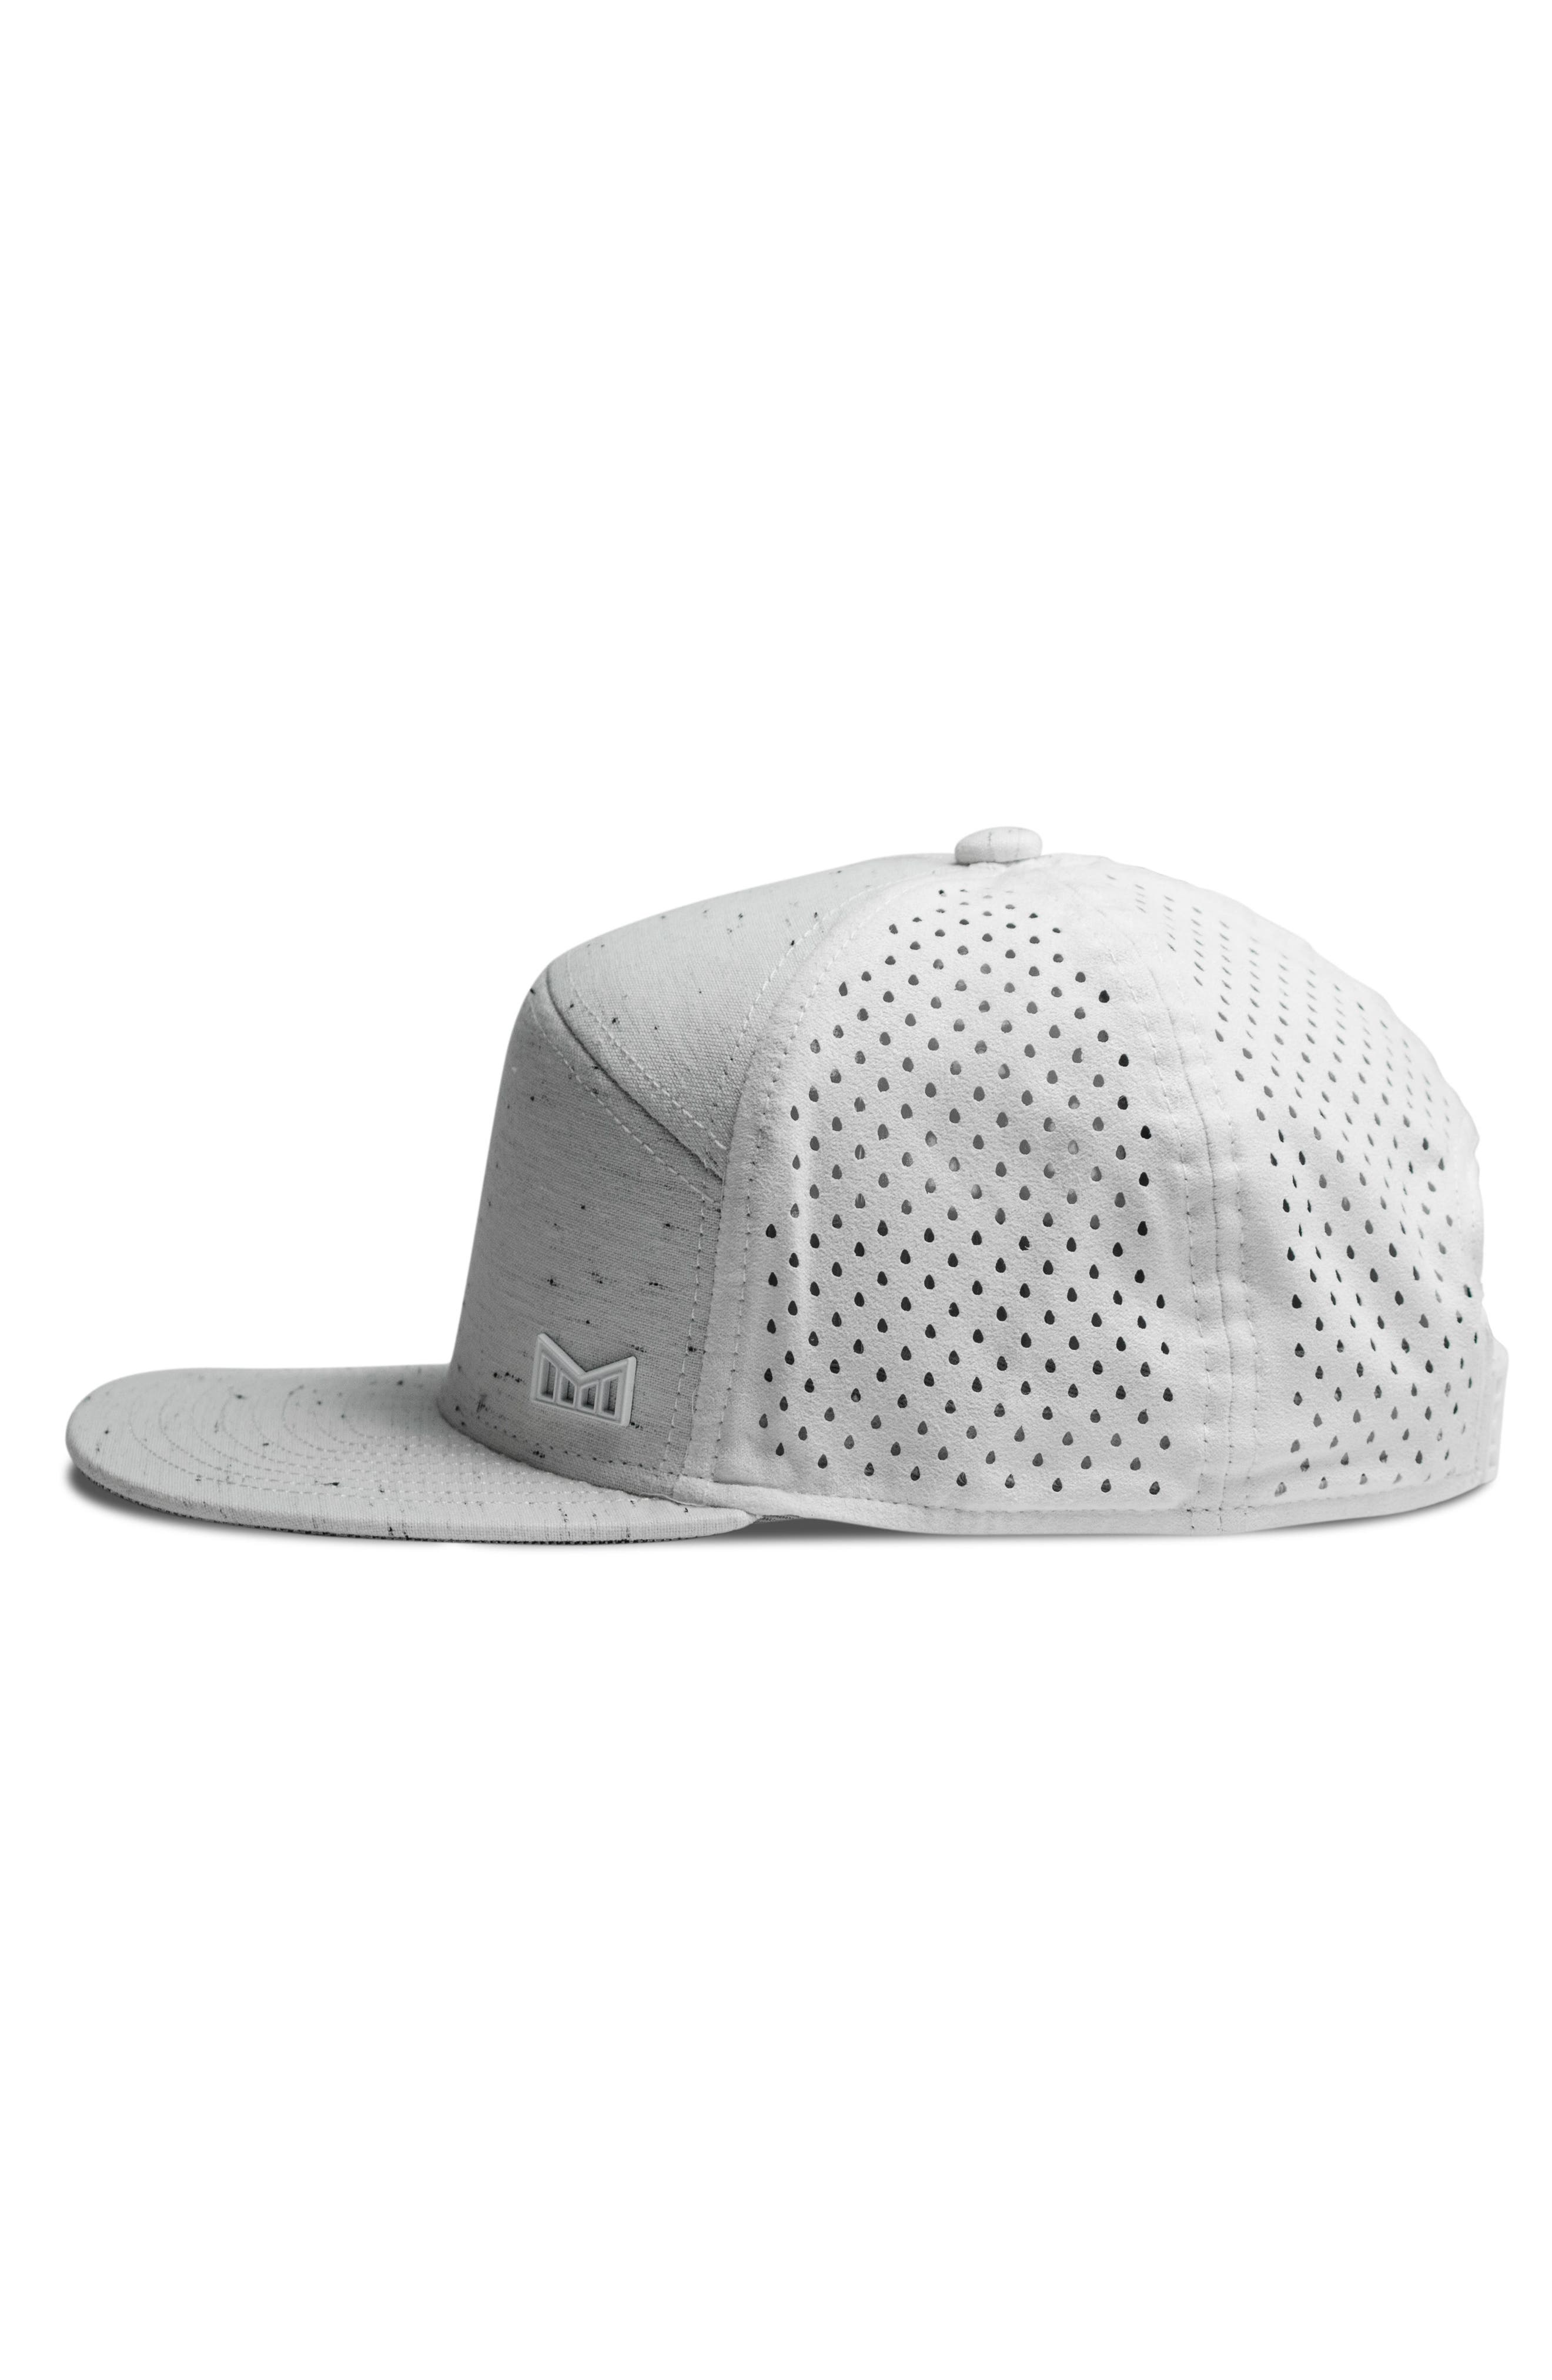 new style d2e7e ba460 ... nordstrom 747e5 85497  norway melin trenches snapback baseball cap  white 9baef 556dc